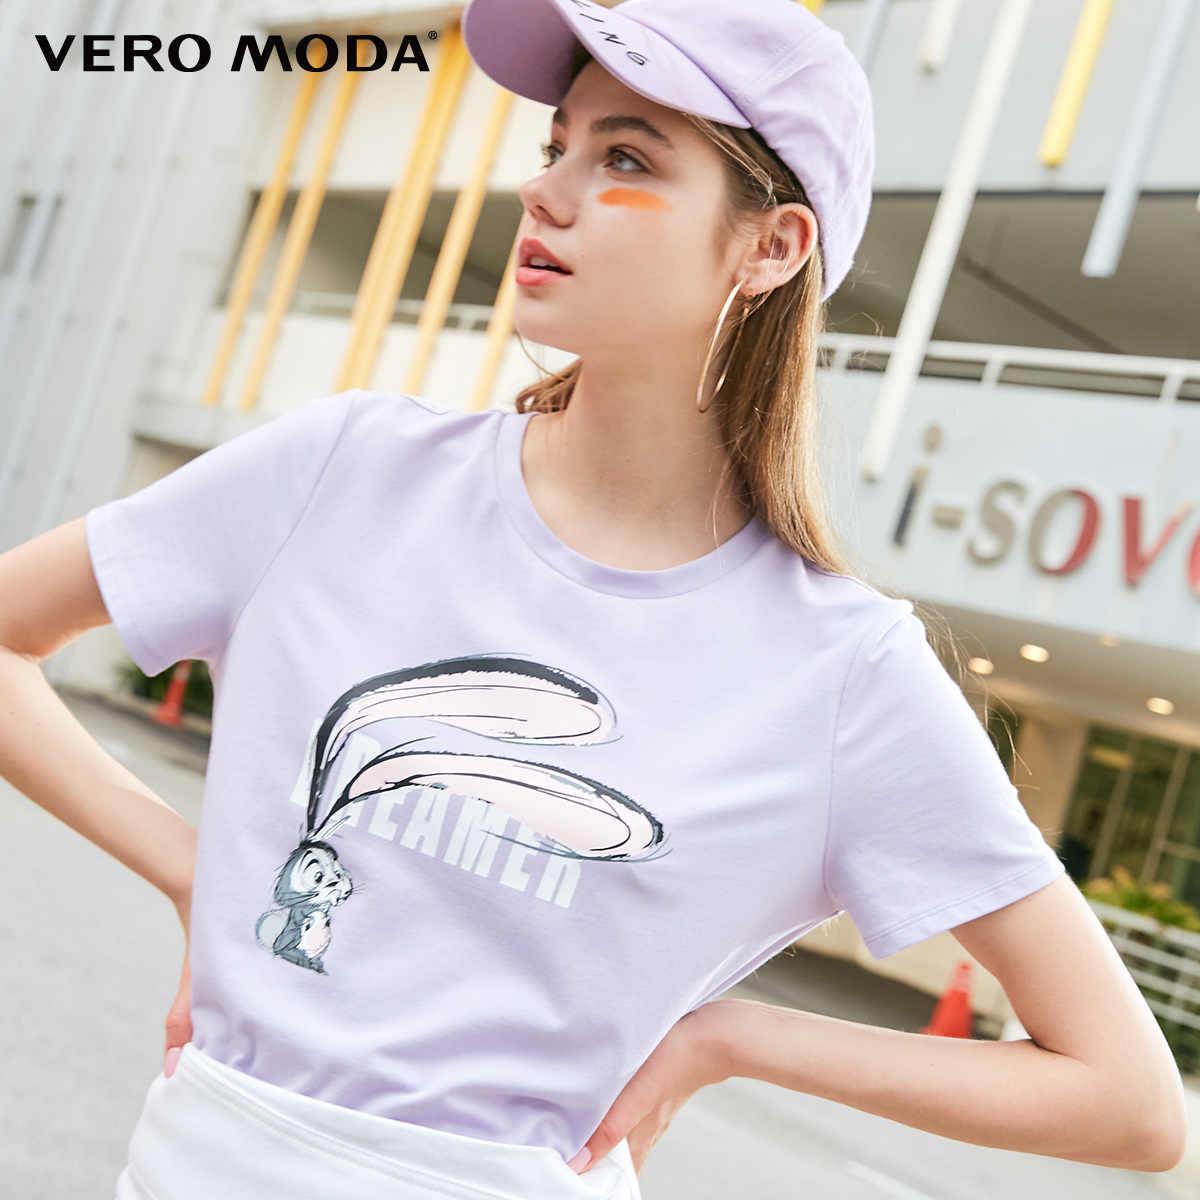 Vero Moda 여성 면직물 & 동물 무늬 프린트 Streetwear Casul 티셔츠 | 319201562